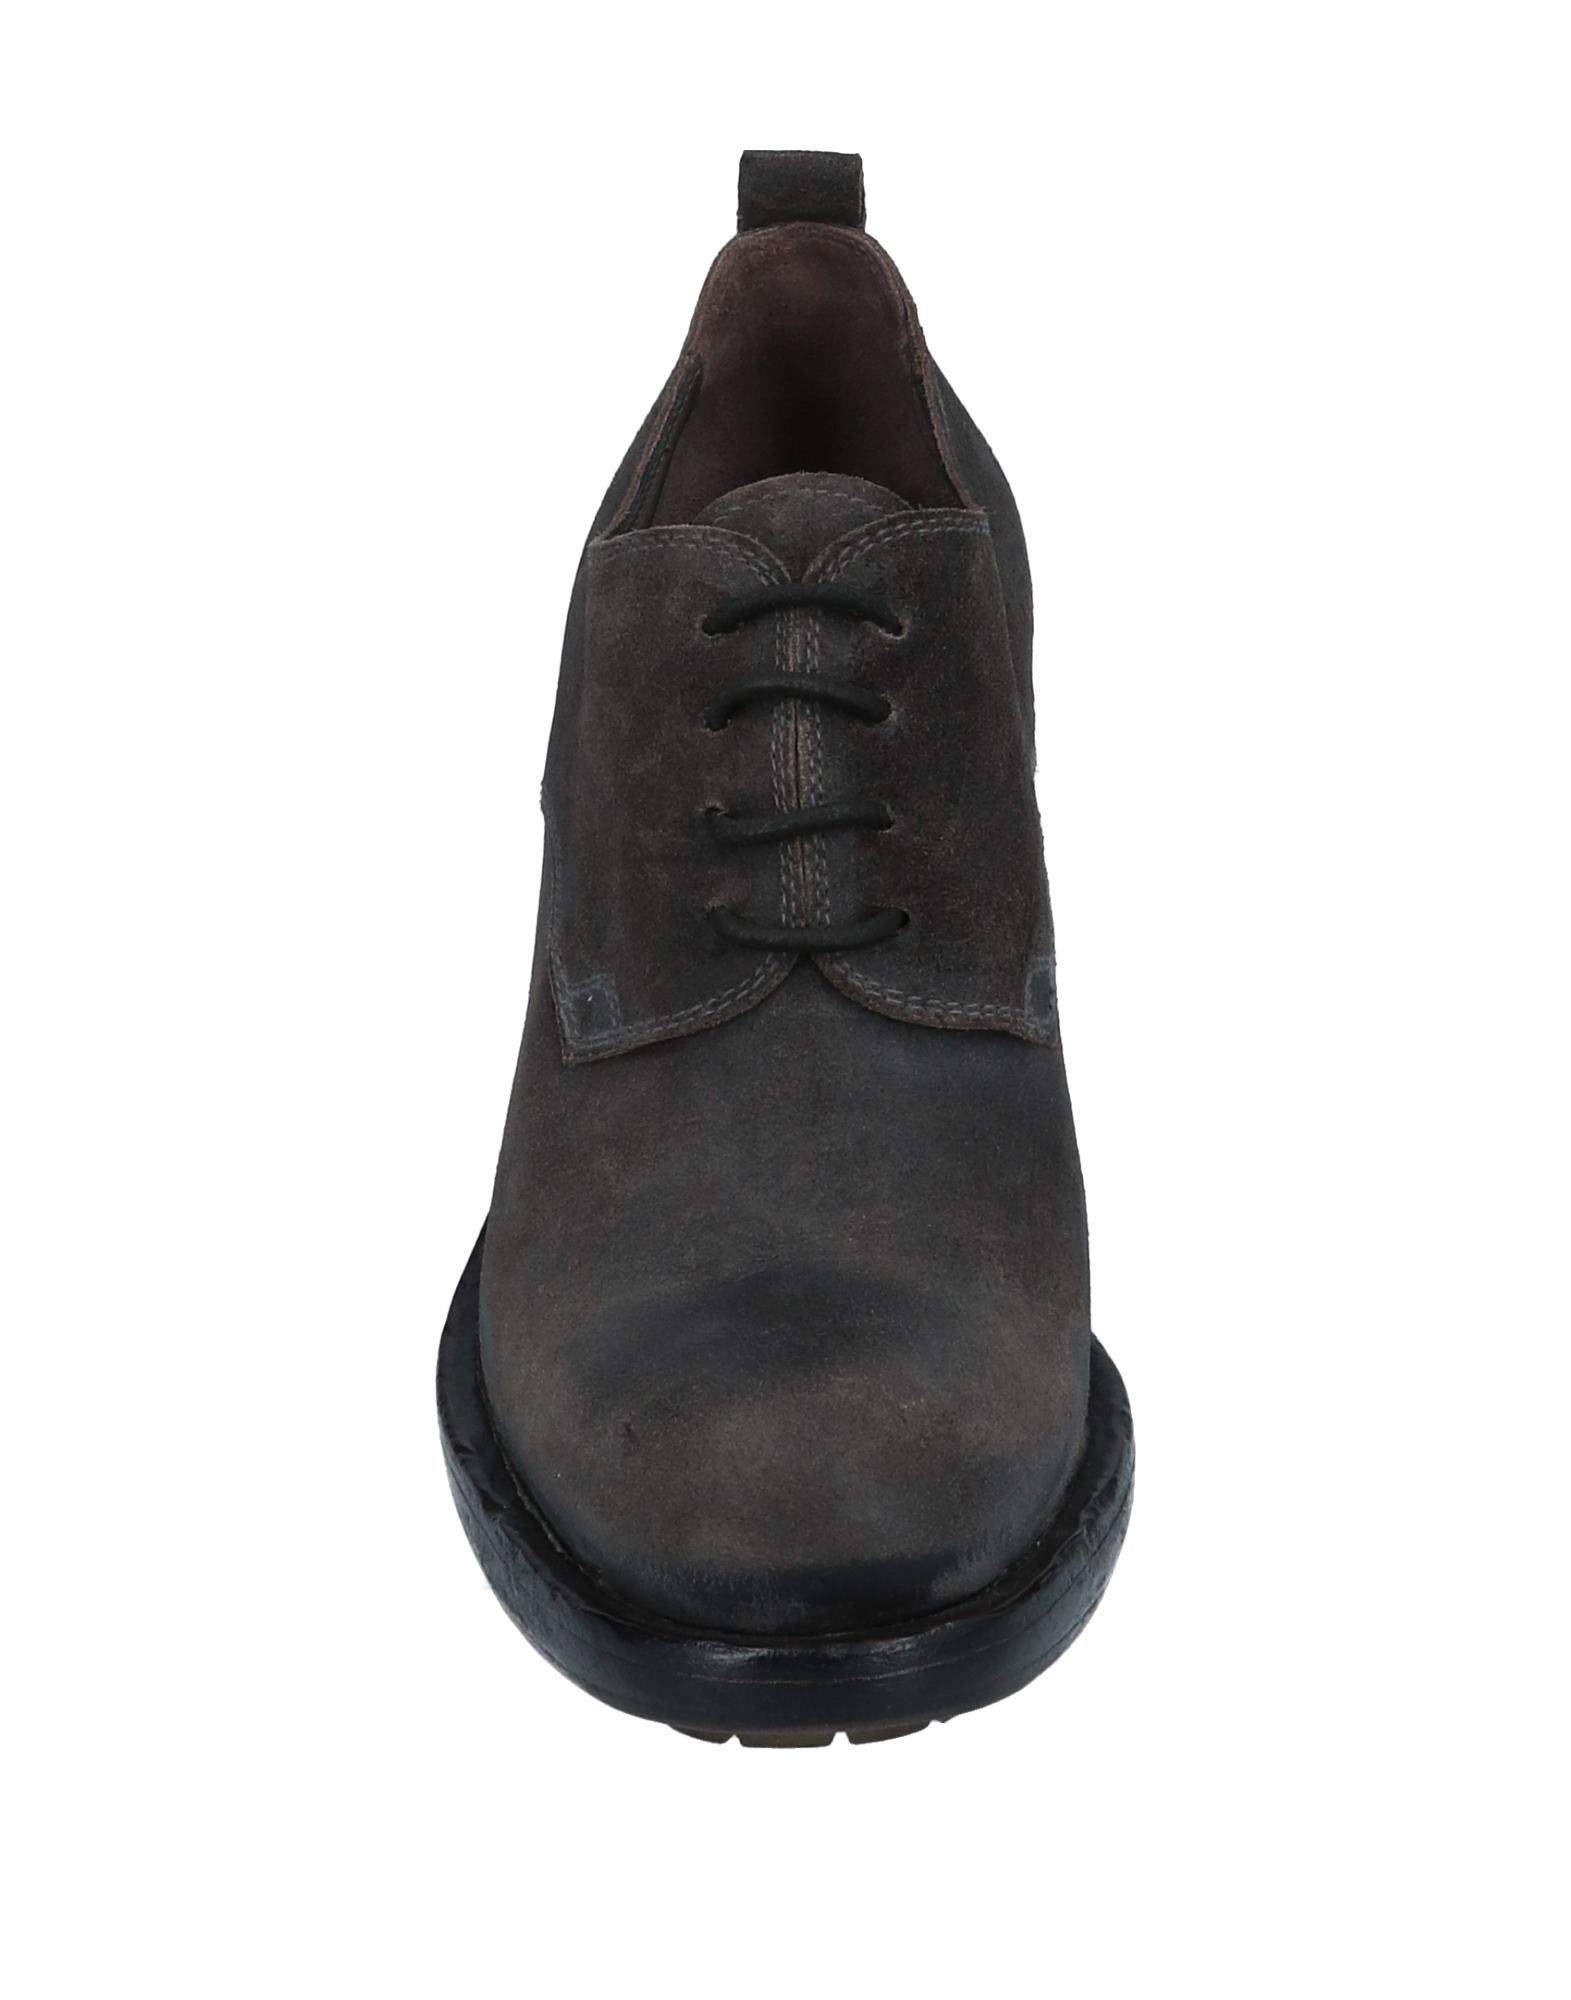 Rabatt Damen Schuhe Rocco P. Schnürschuhe Damen Rabatt  11554909IS 26df8b